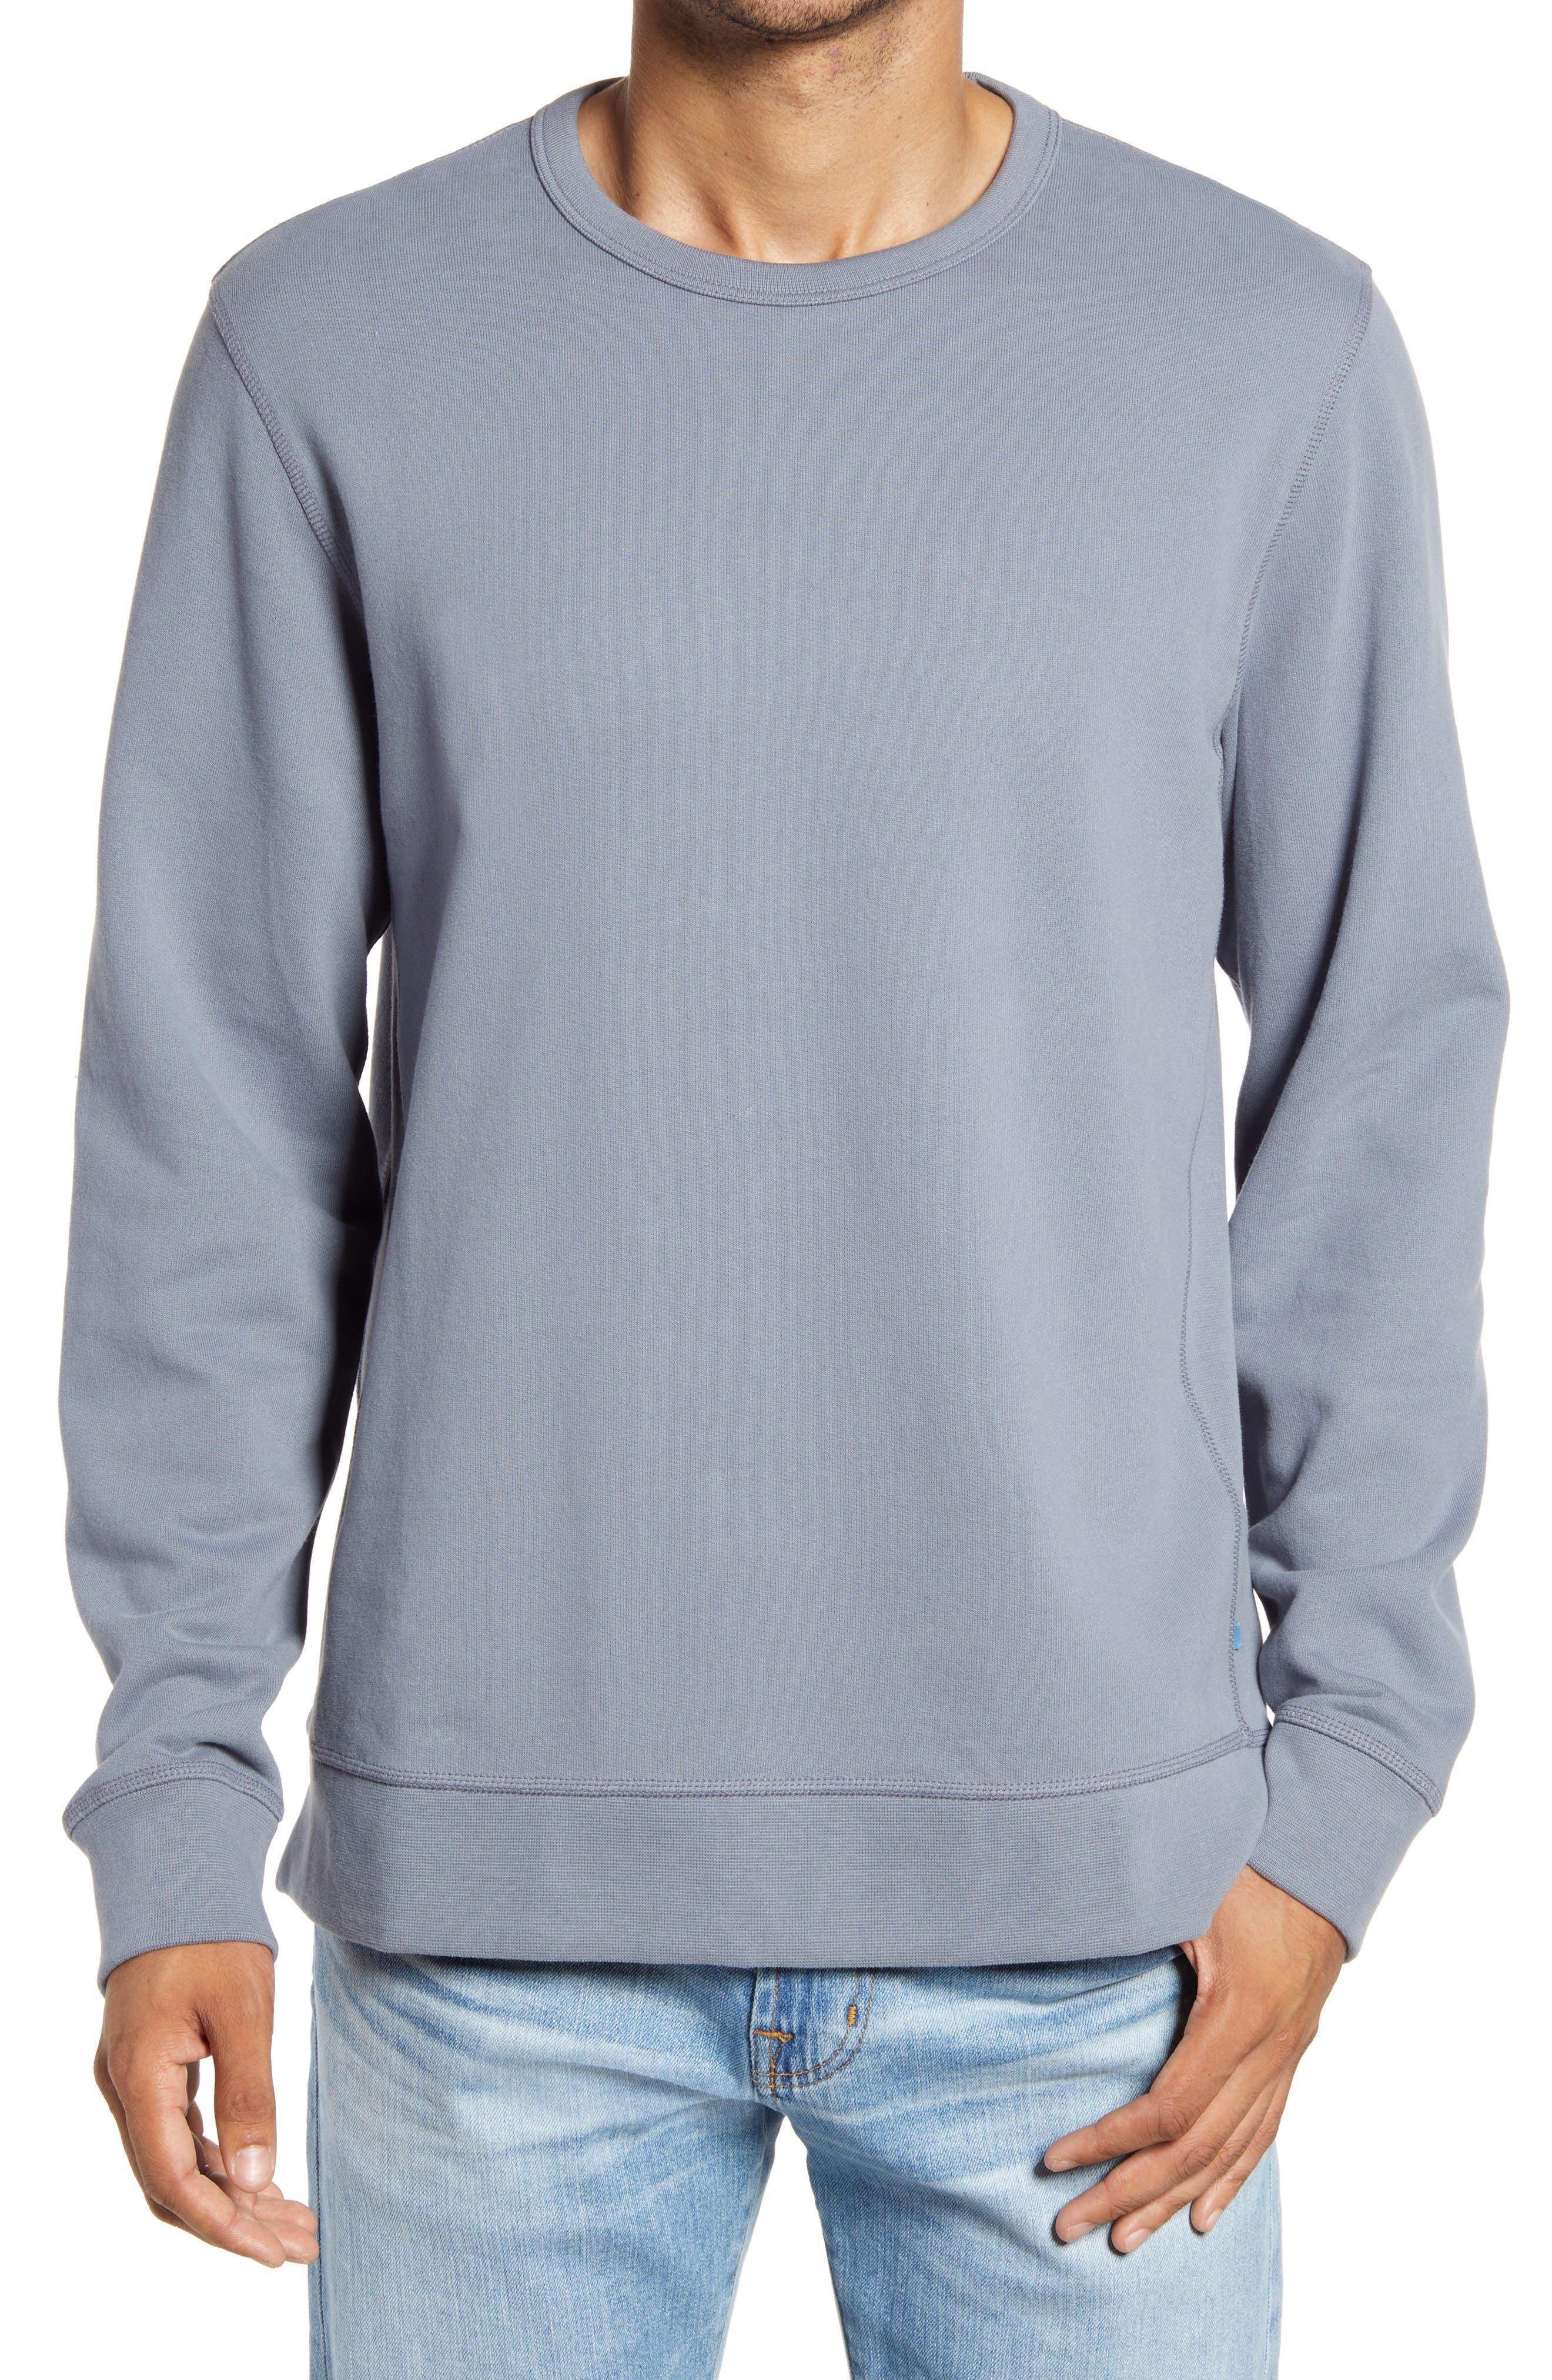 Jason Scott Maddux Crewneck Pima Cotton Sweatshirt